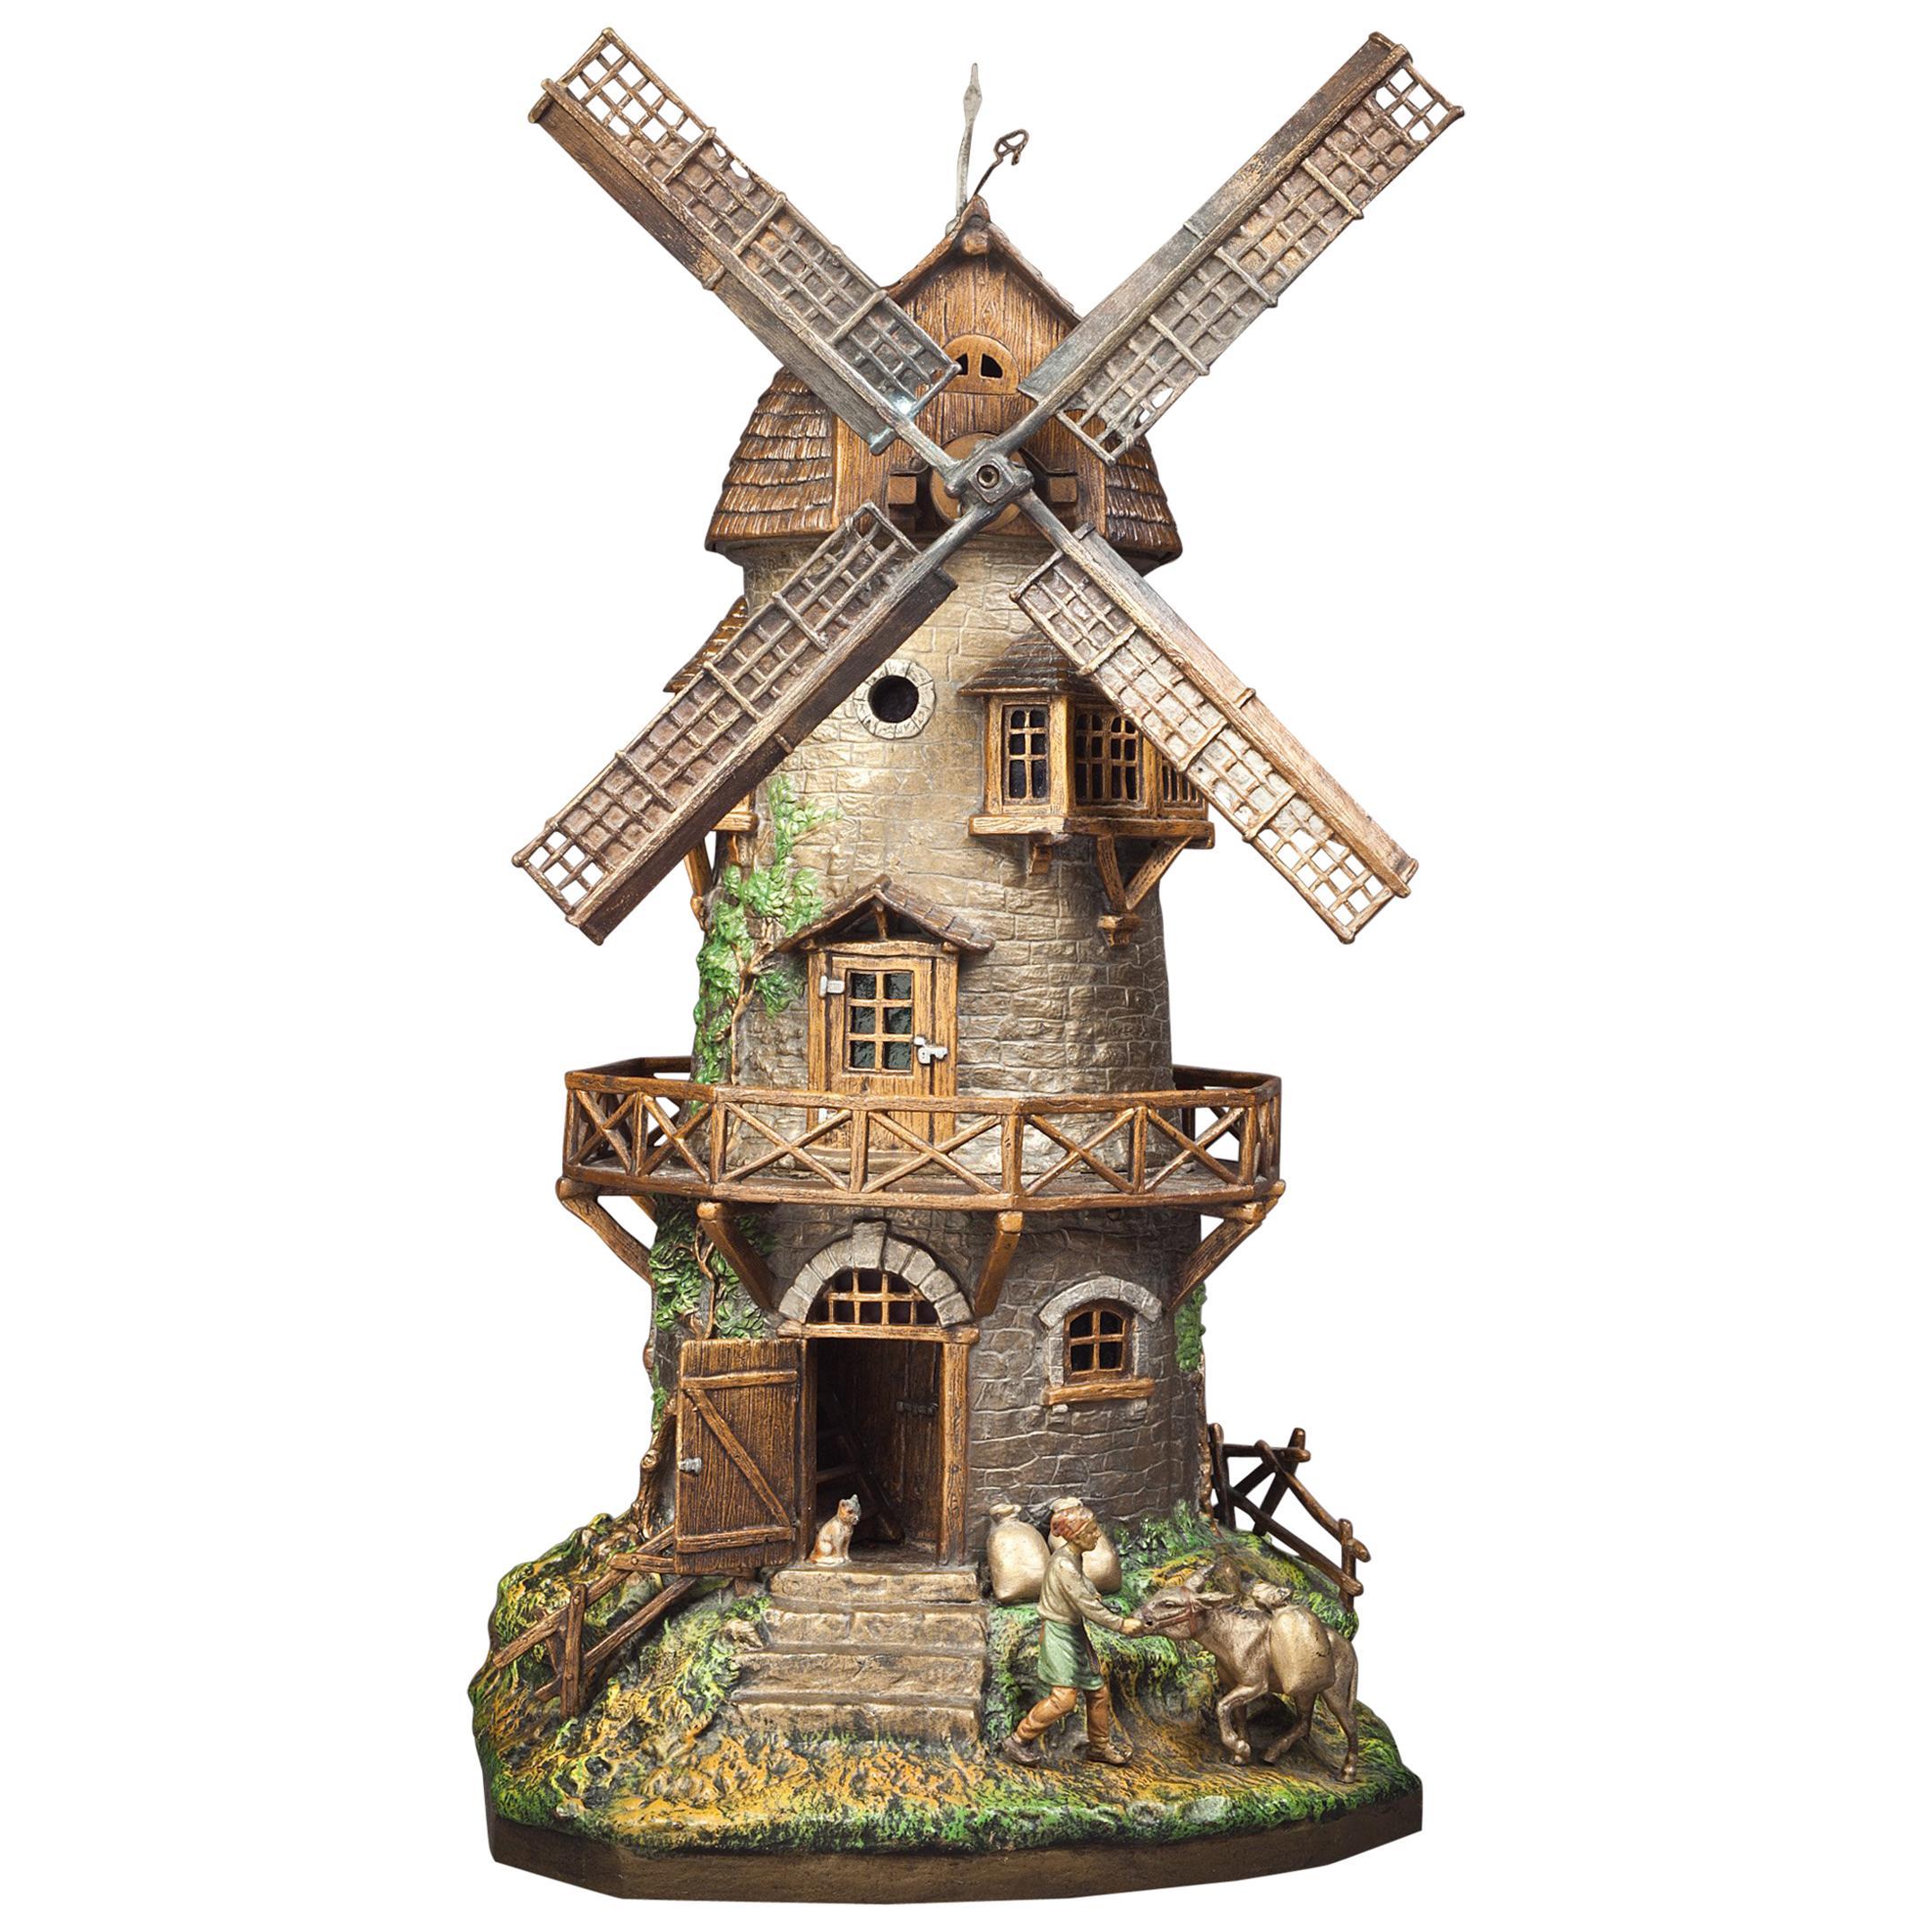 Vienna Bronze Cold Painted Windmill Lamp, Franz Bergman, circa 1900